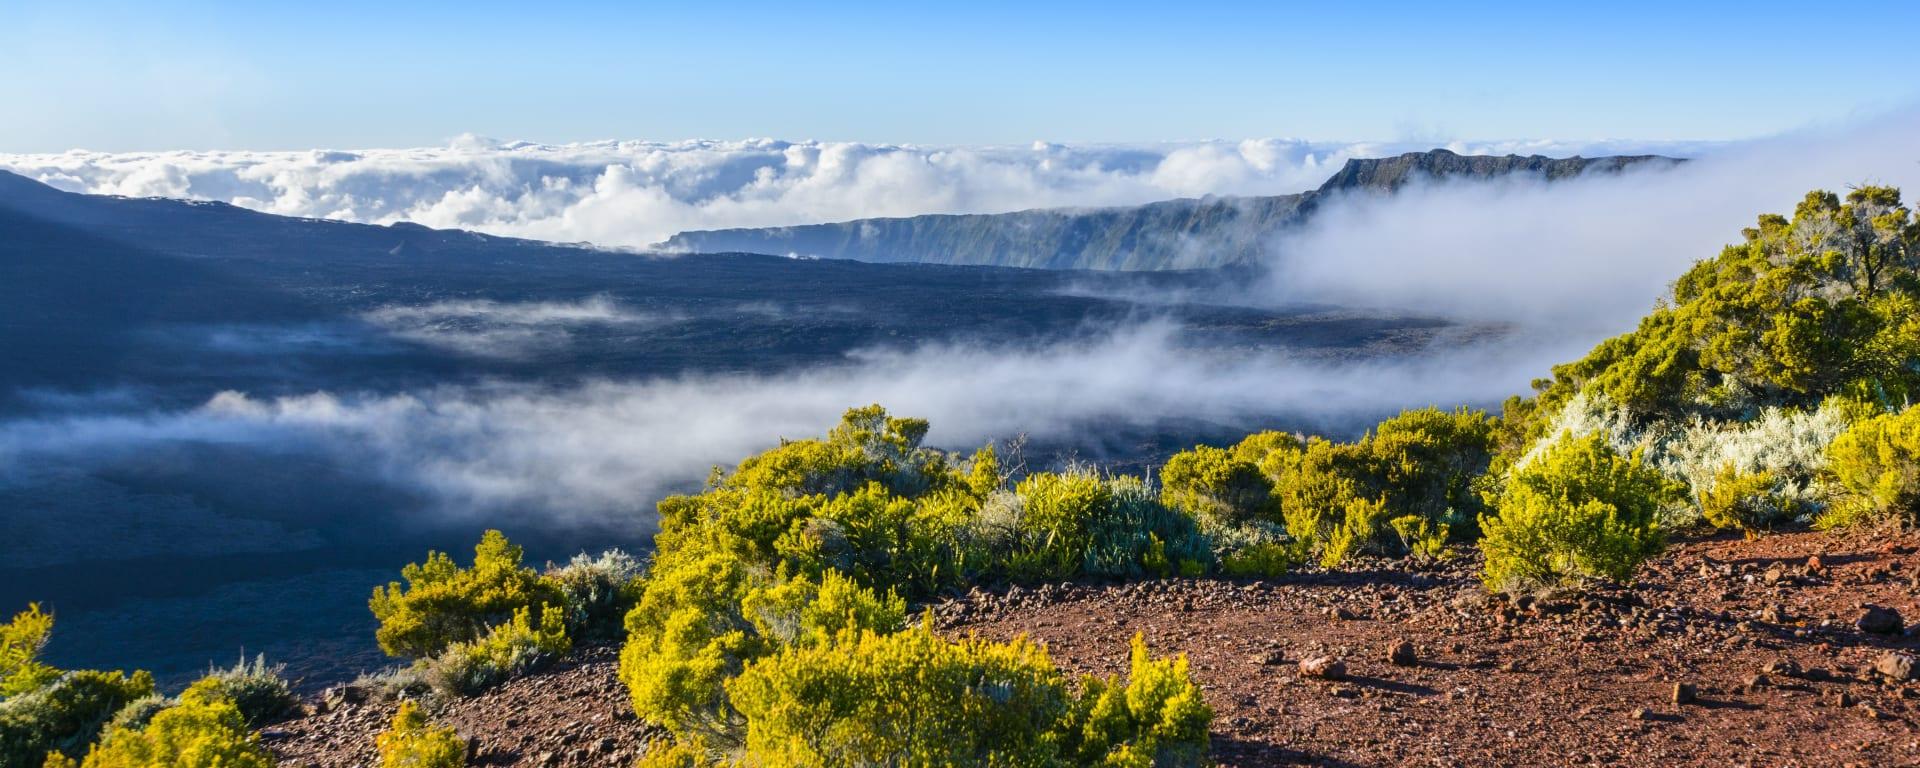 Höhepunkte La Réunion ab Küstenregion: Reunion Vulkan Landschaft